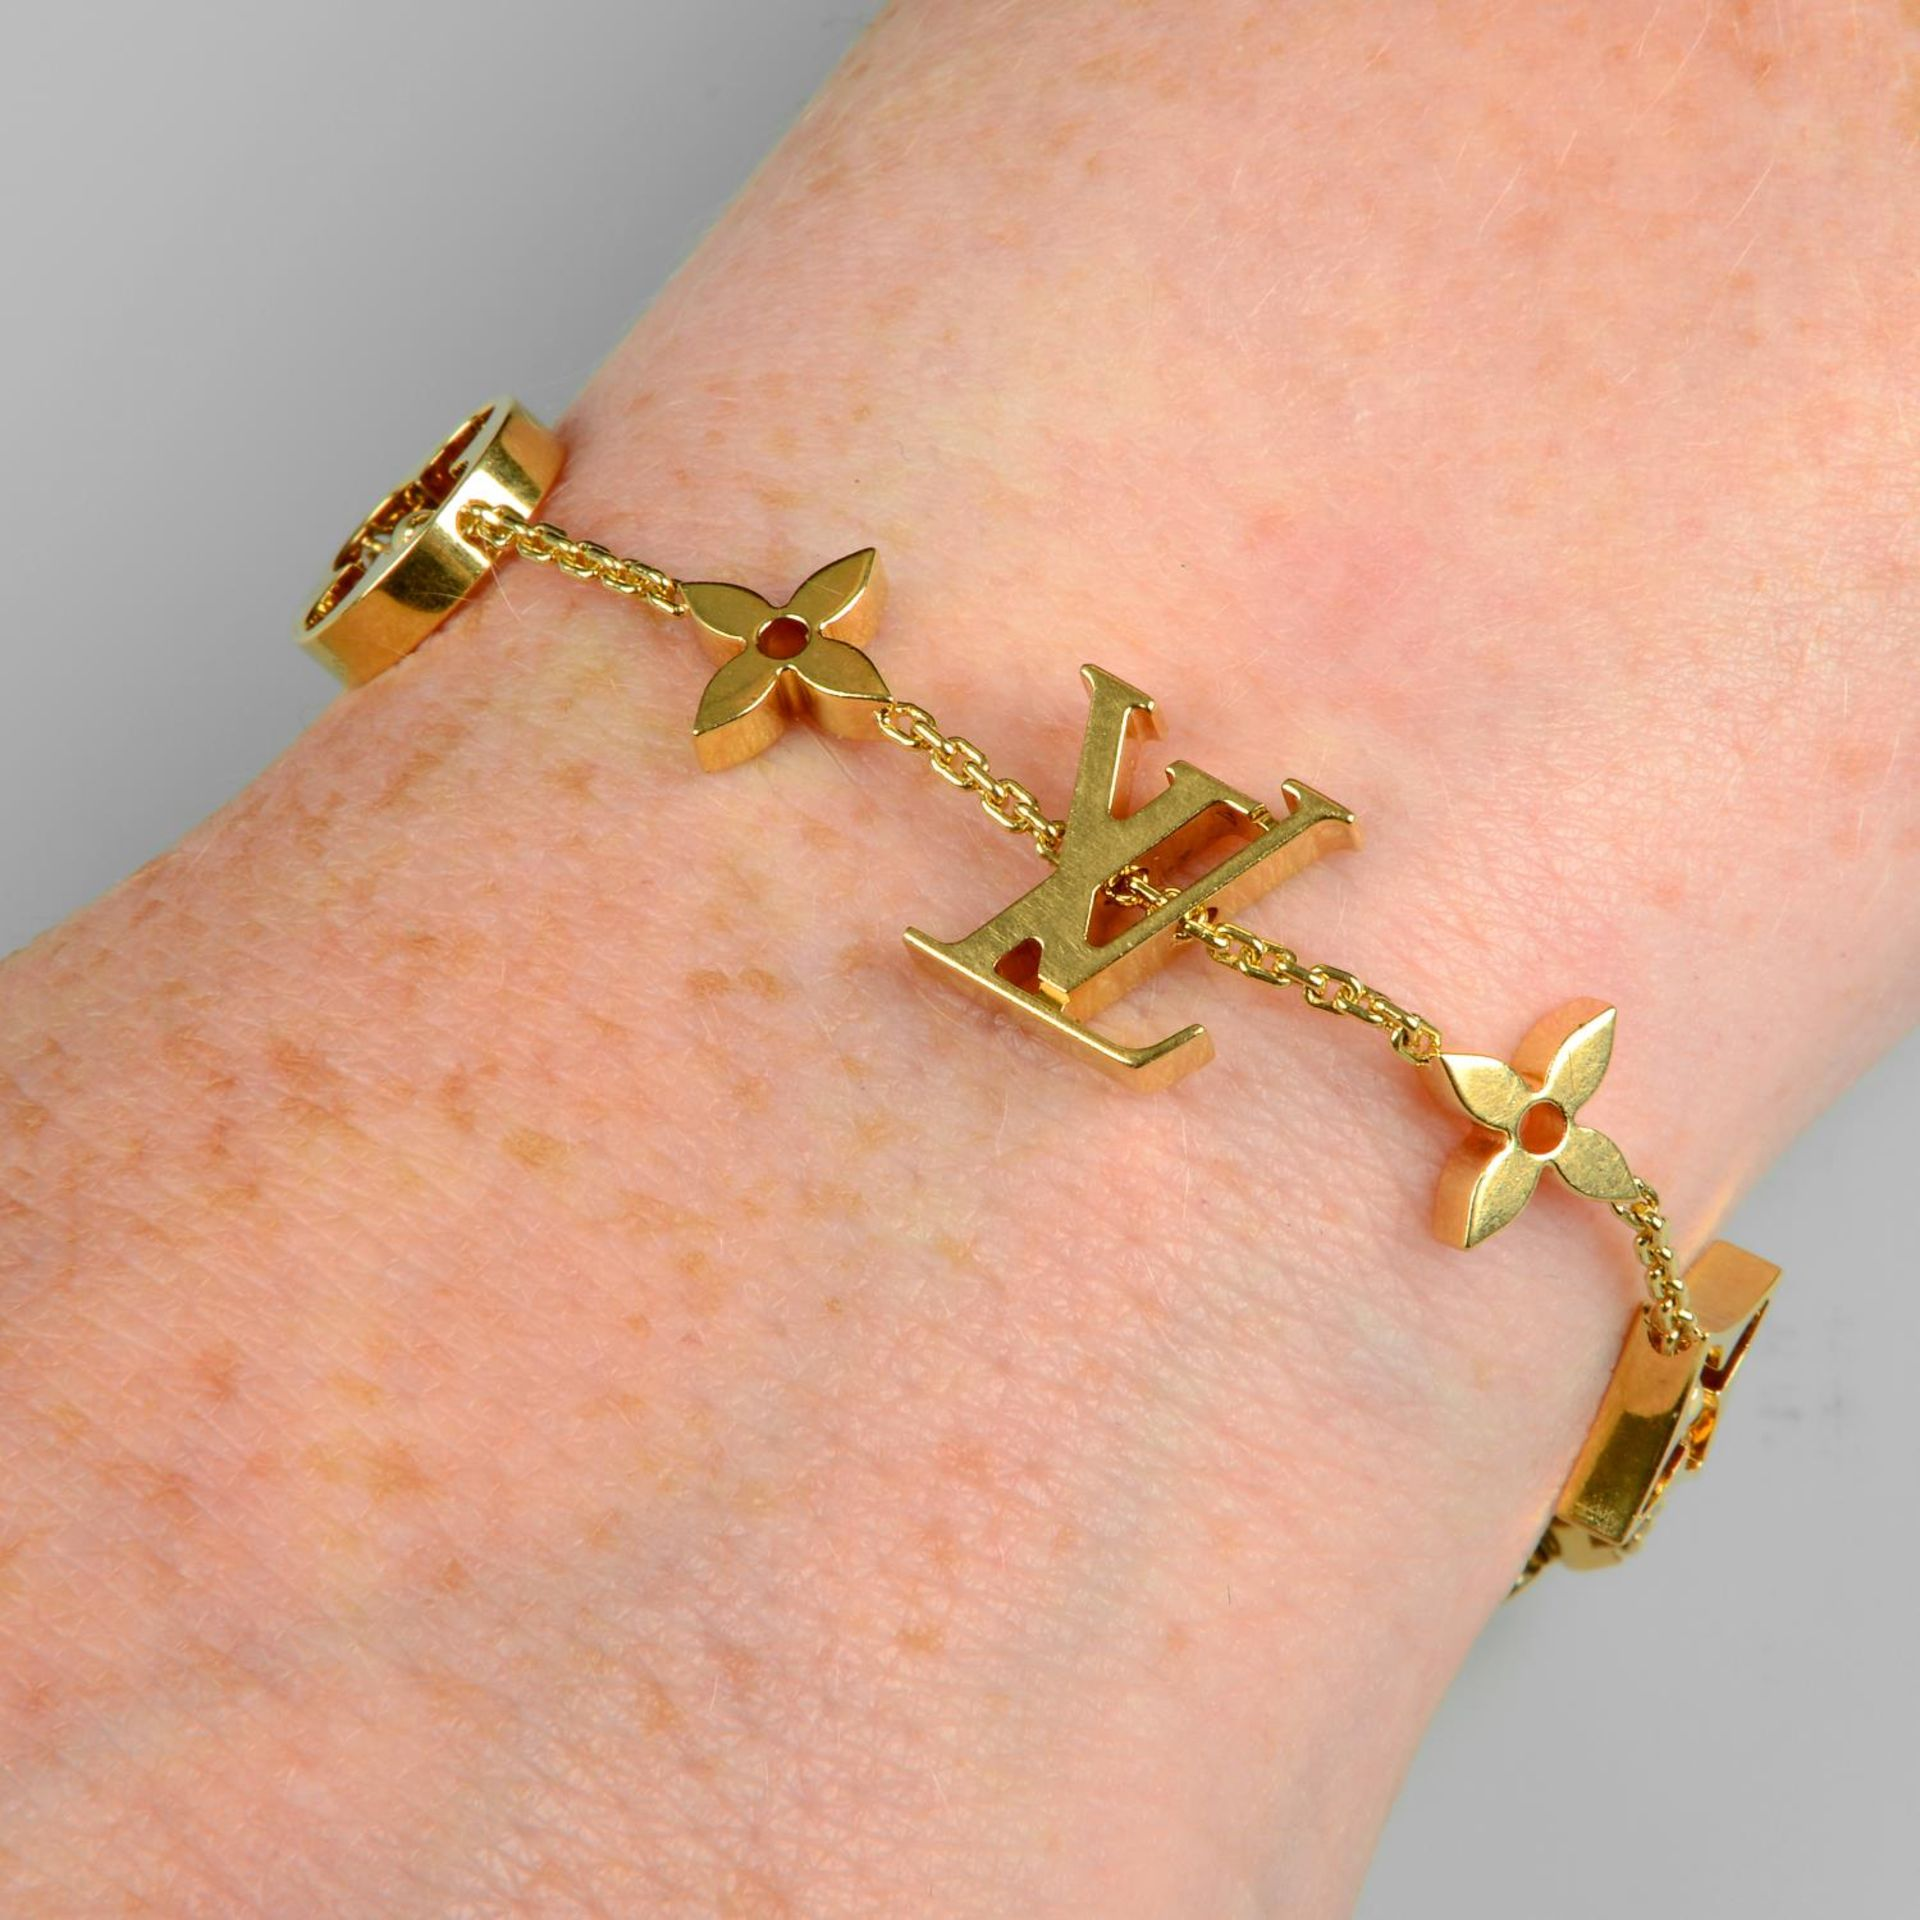 An 'Idylee Blossom Monogram' bracelet,